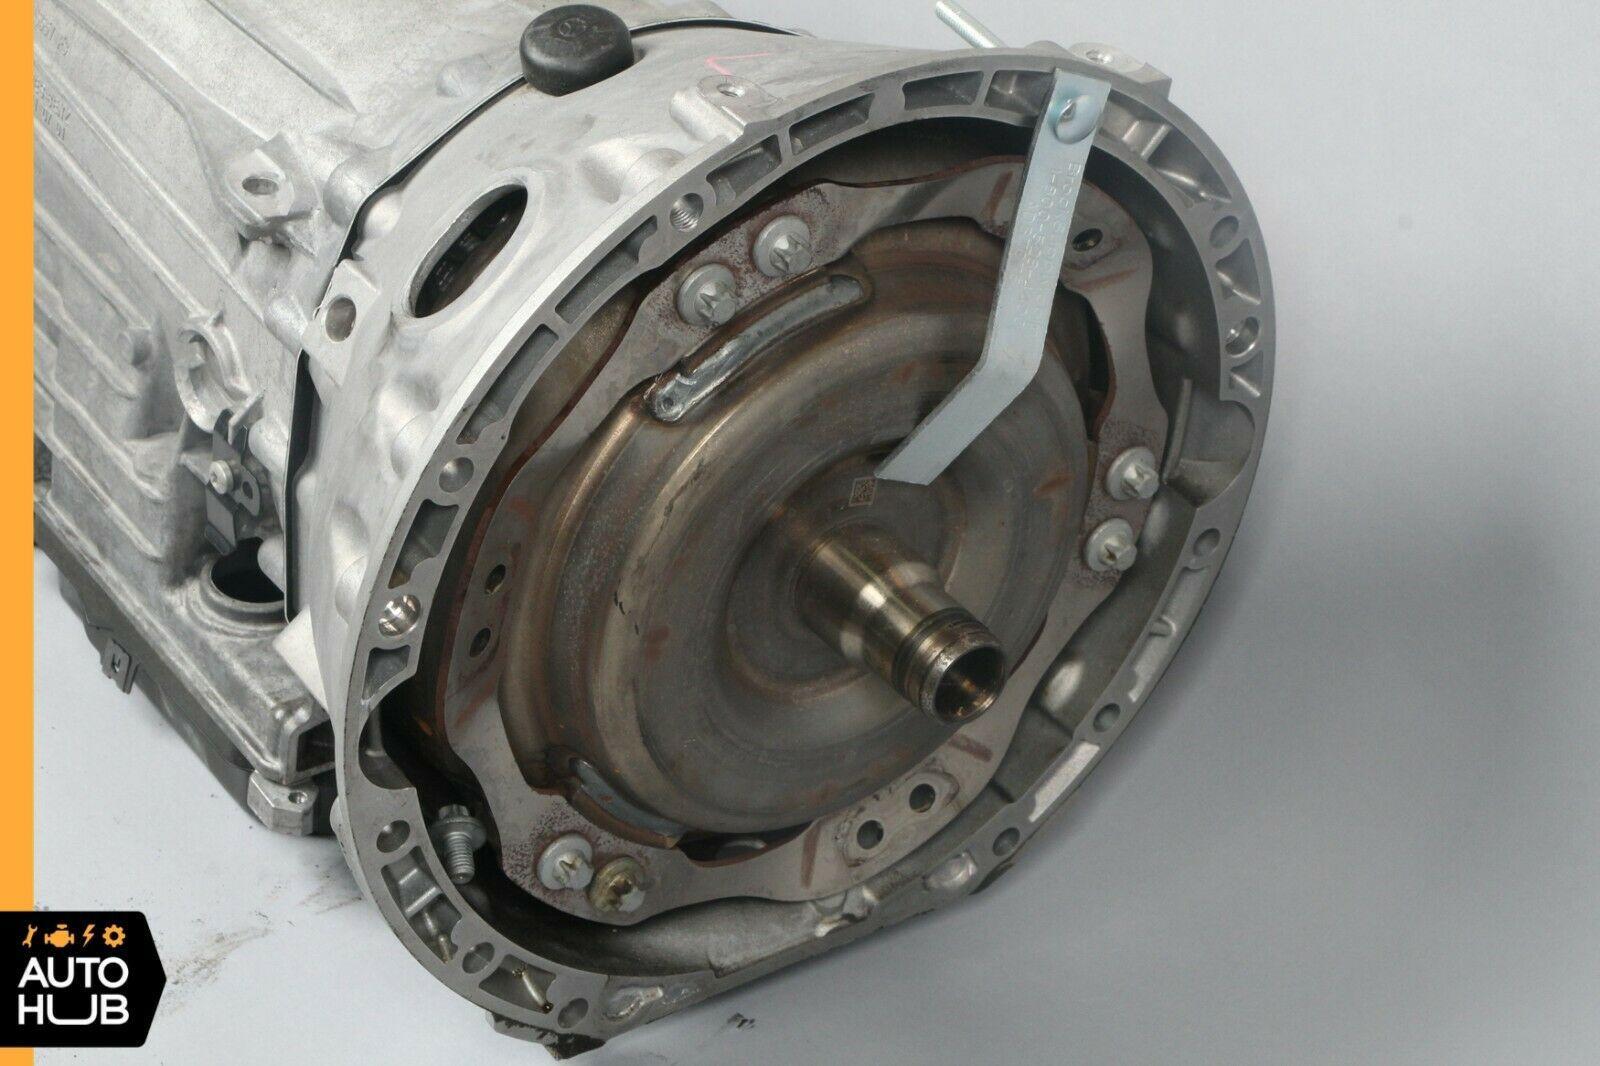 Automatic Transmission 722.950 OEM 10-13 Mercedes W221 S400 Hybrid 722.9 7G-Tronic